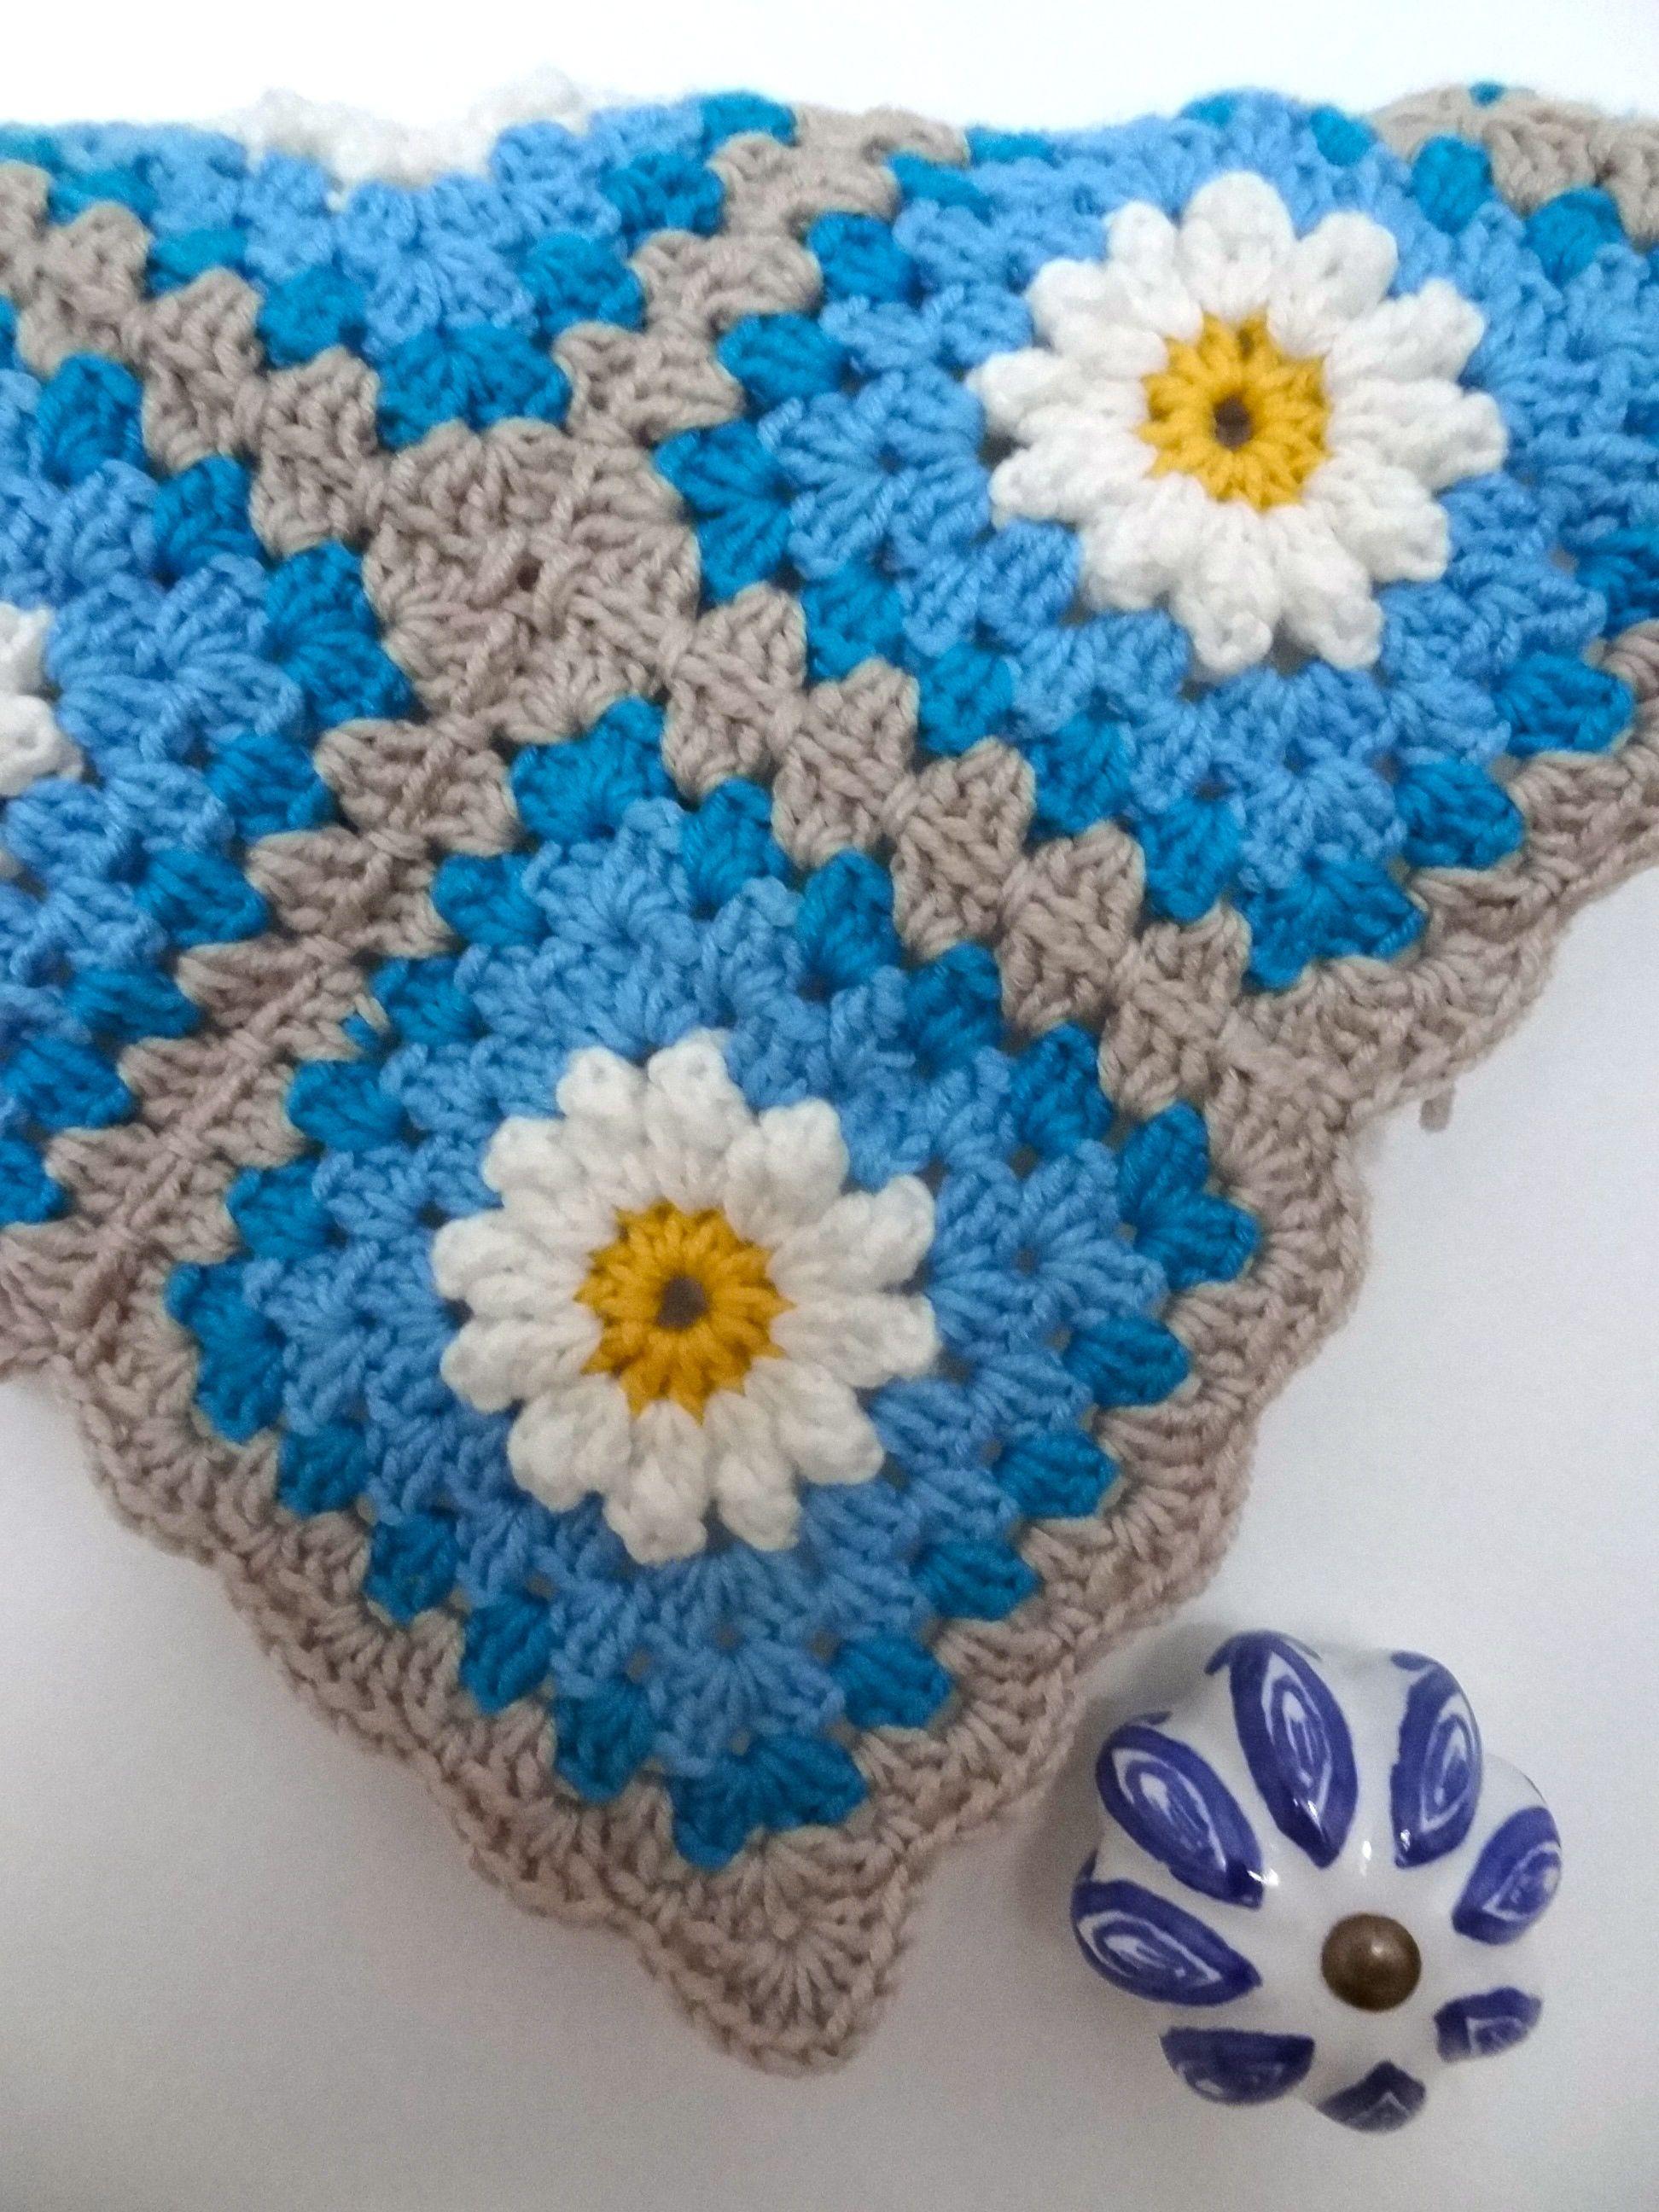 DSC06656 | Häkeln Crochet Granny Patchwork Decken | Pinterest ...